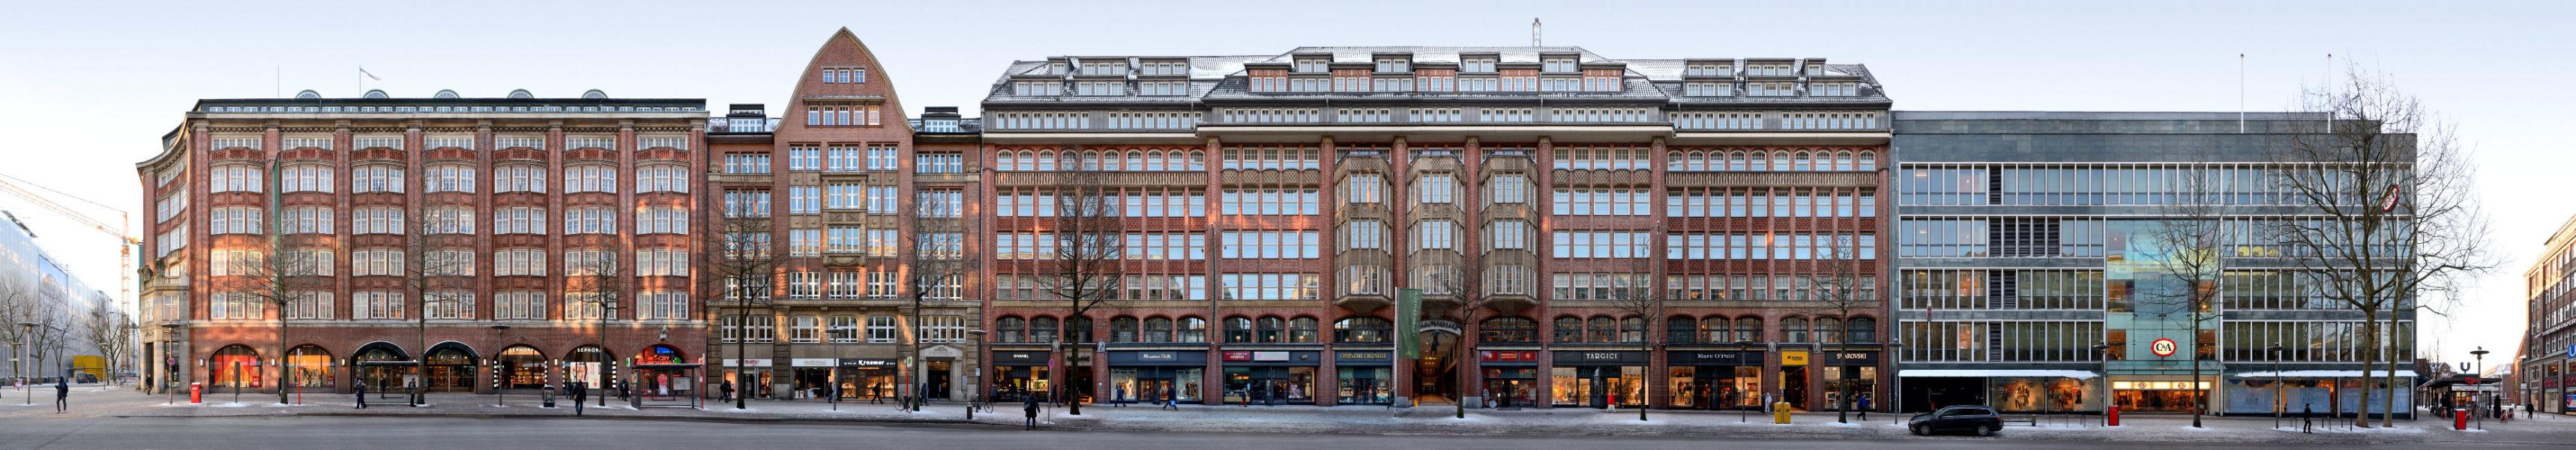 Mönckebergstraße | Levantehaus